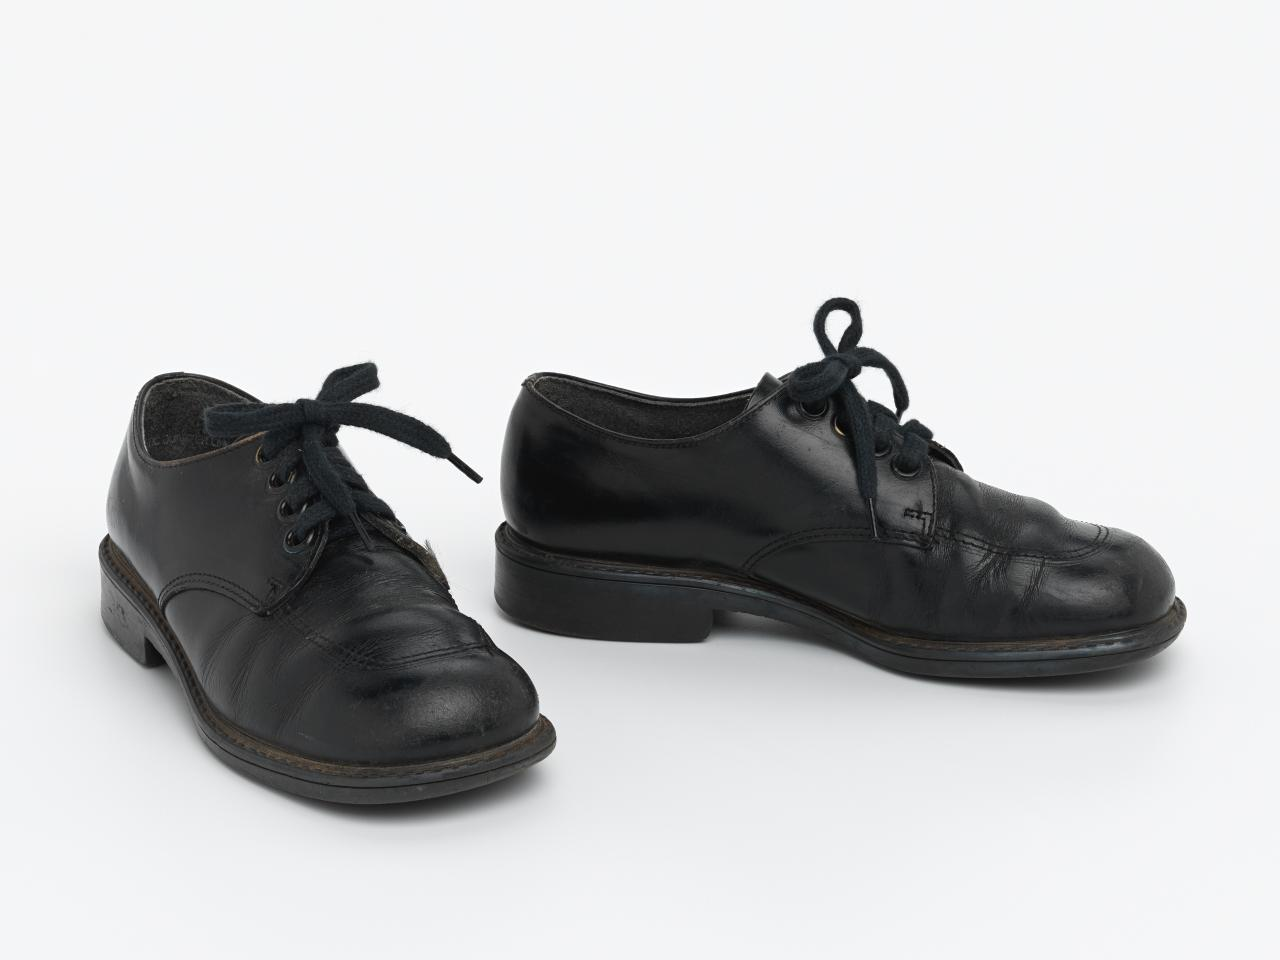 School ShoesClarks Northshoemaker ShoesClarks School Northshoemaker School AustraliaBalwyn AustraliaBalwyn BCWorxde